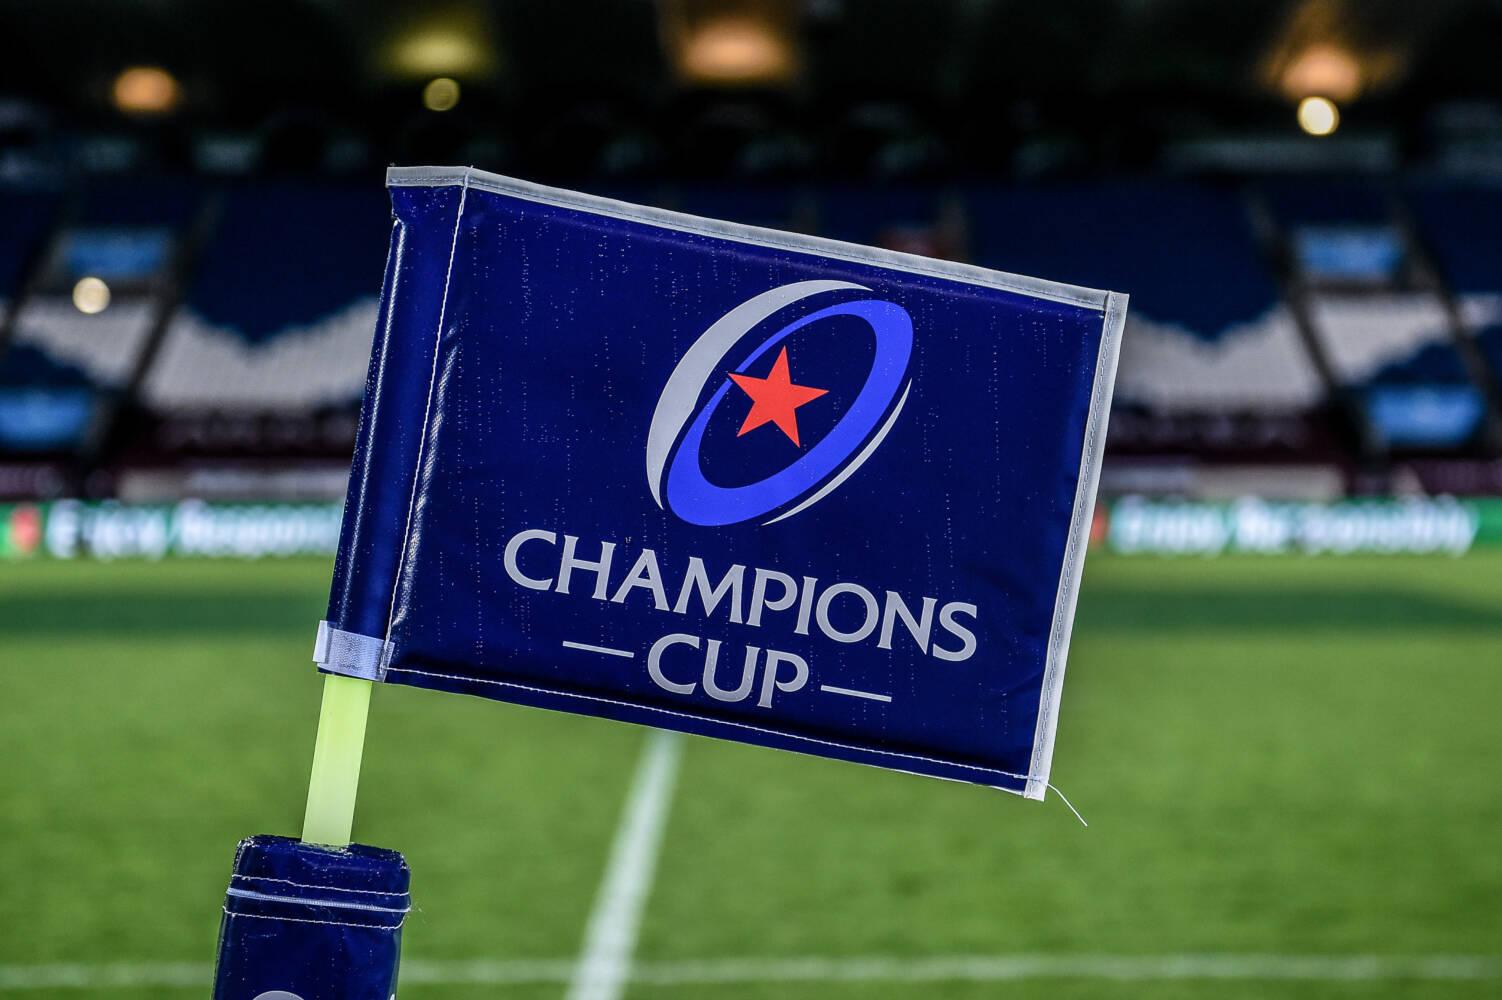 Three Regions heading into Heineken Champions Cup